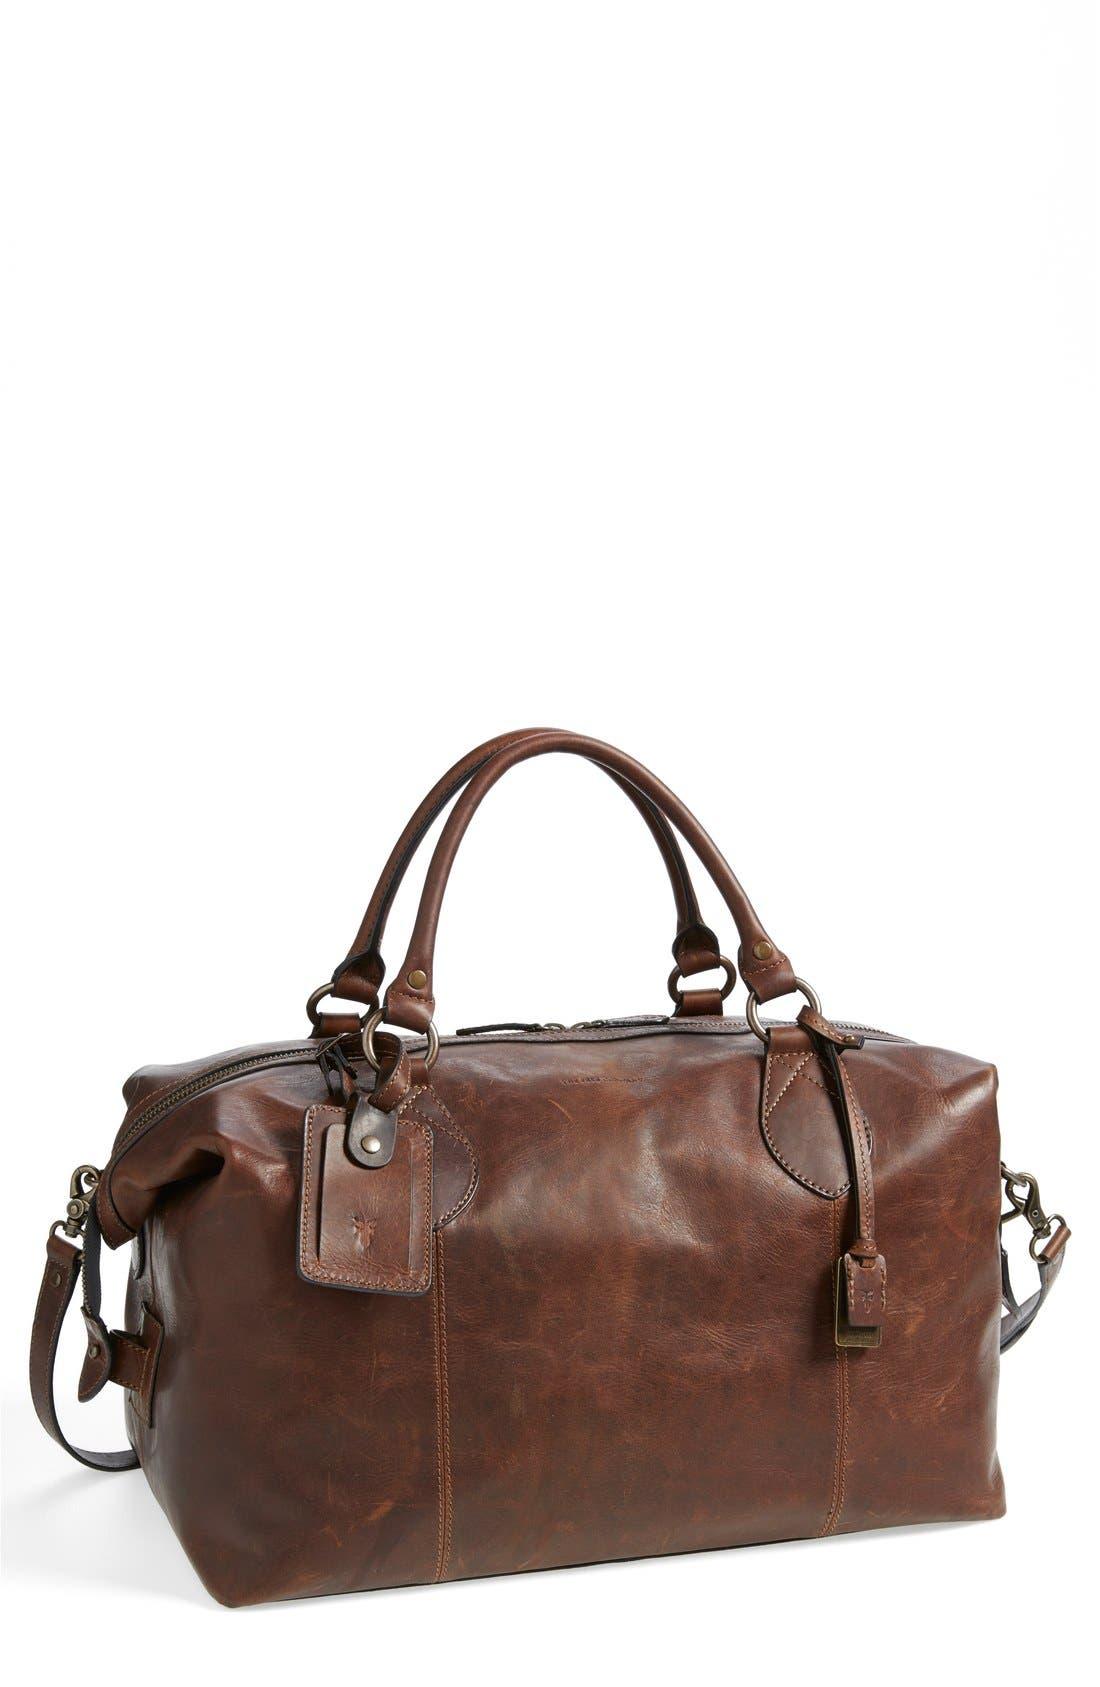 Alternate Image 1 Selected - Frye 'Logan' Leather Overnight Bag (Online Only)